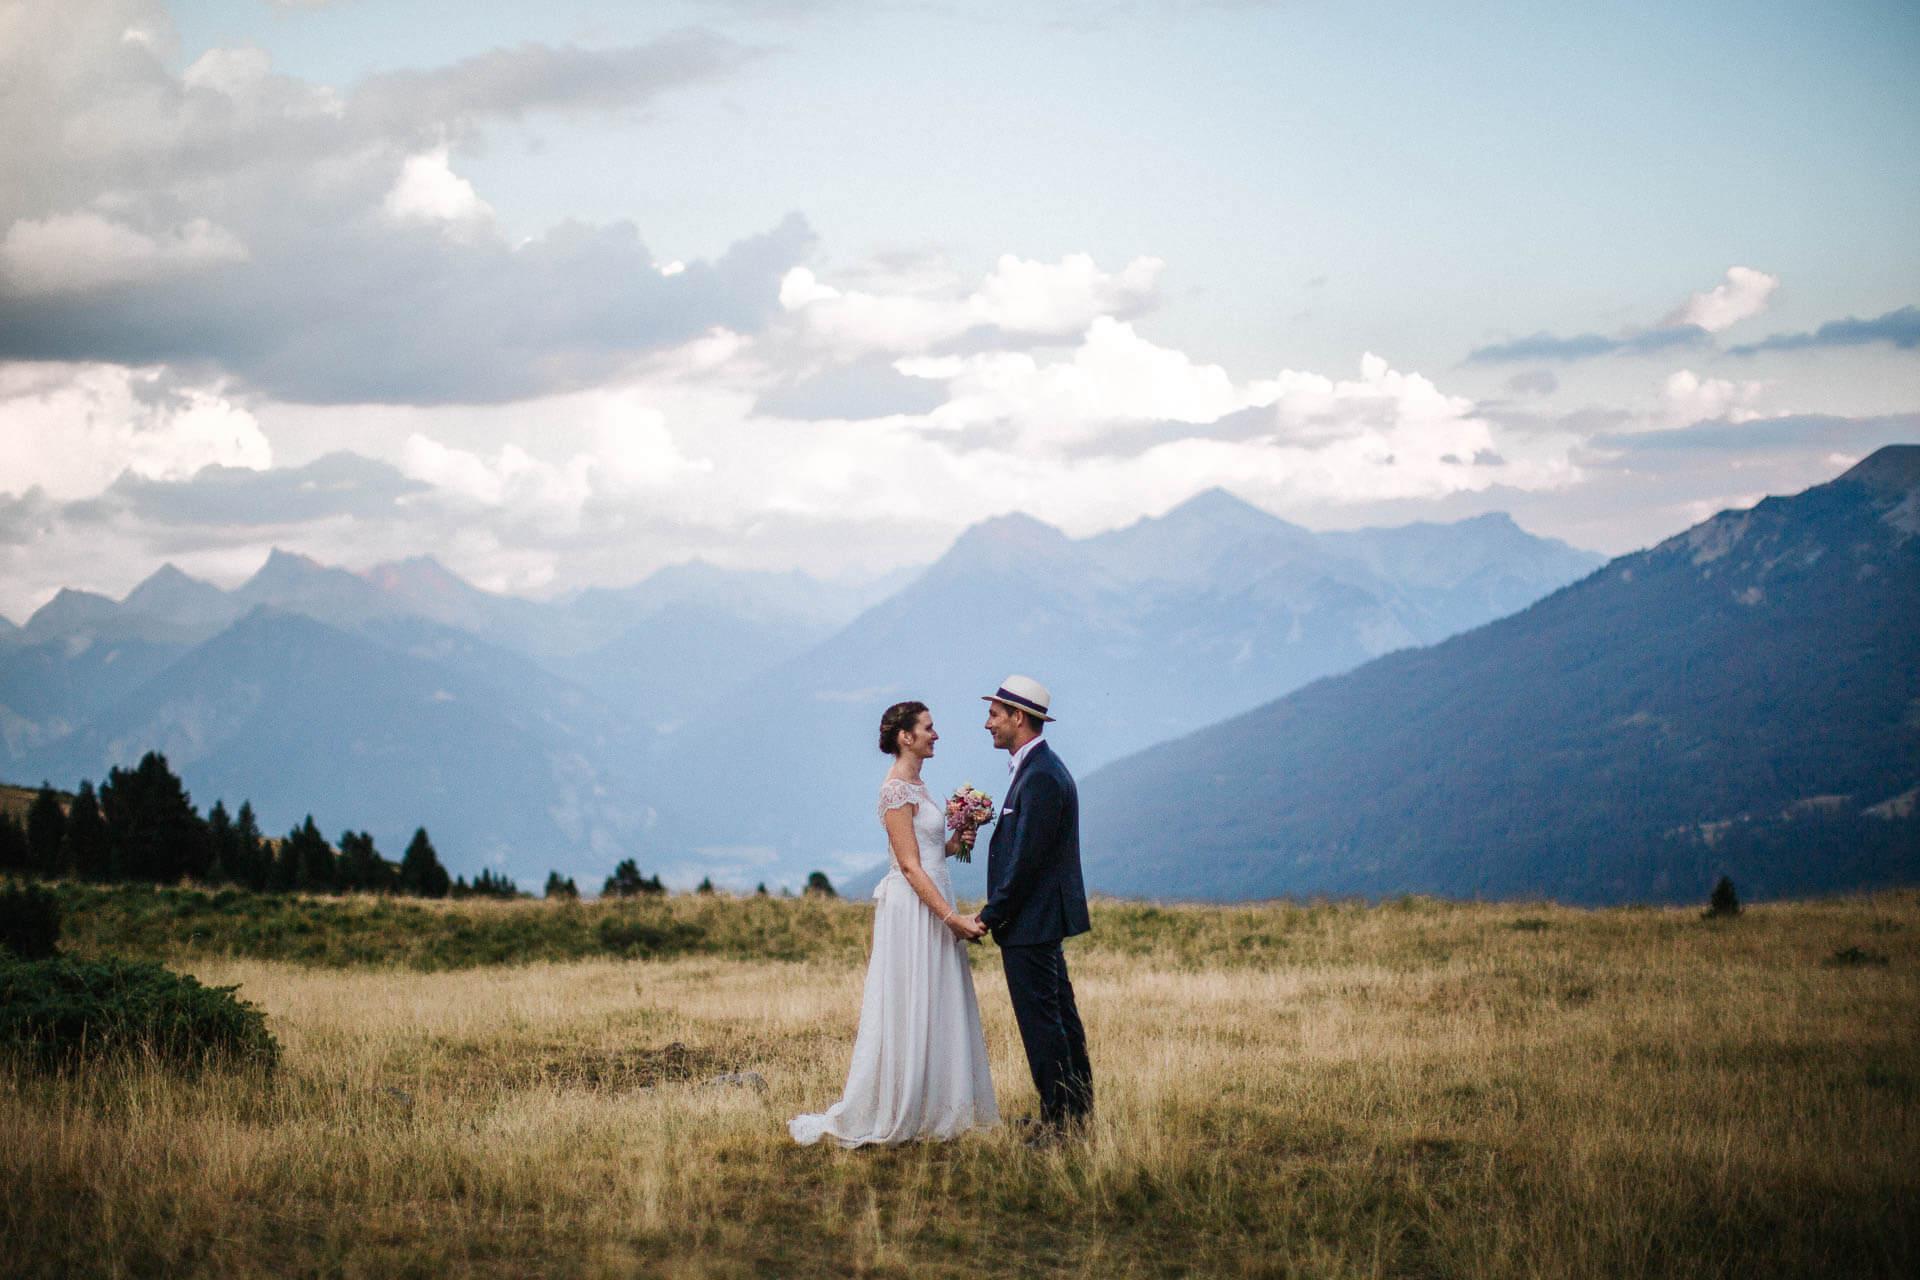 photographe-mariage-alpes-montagne-13